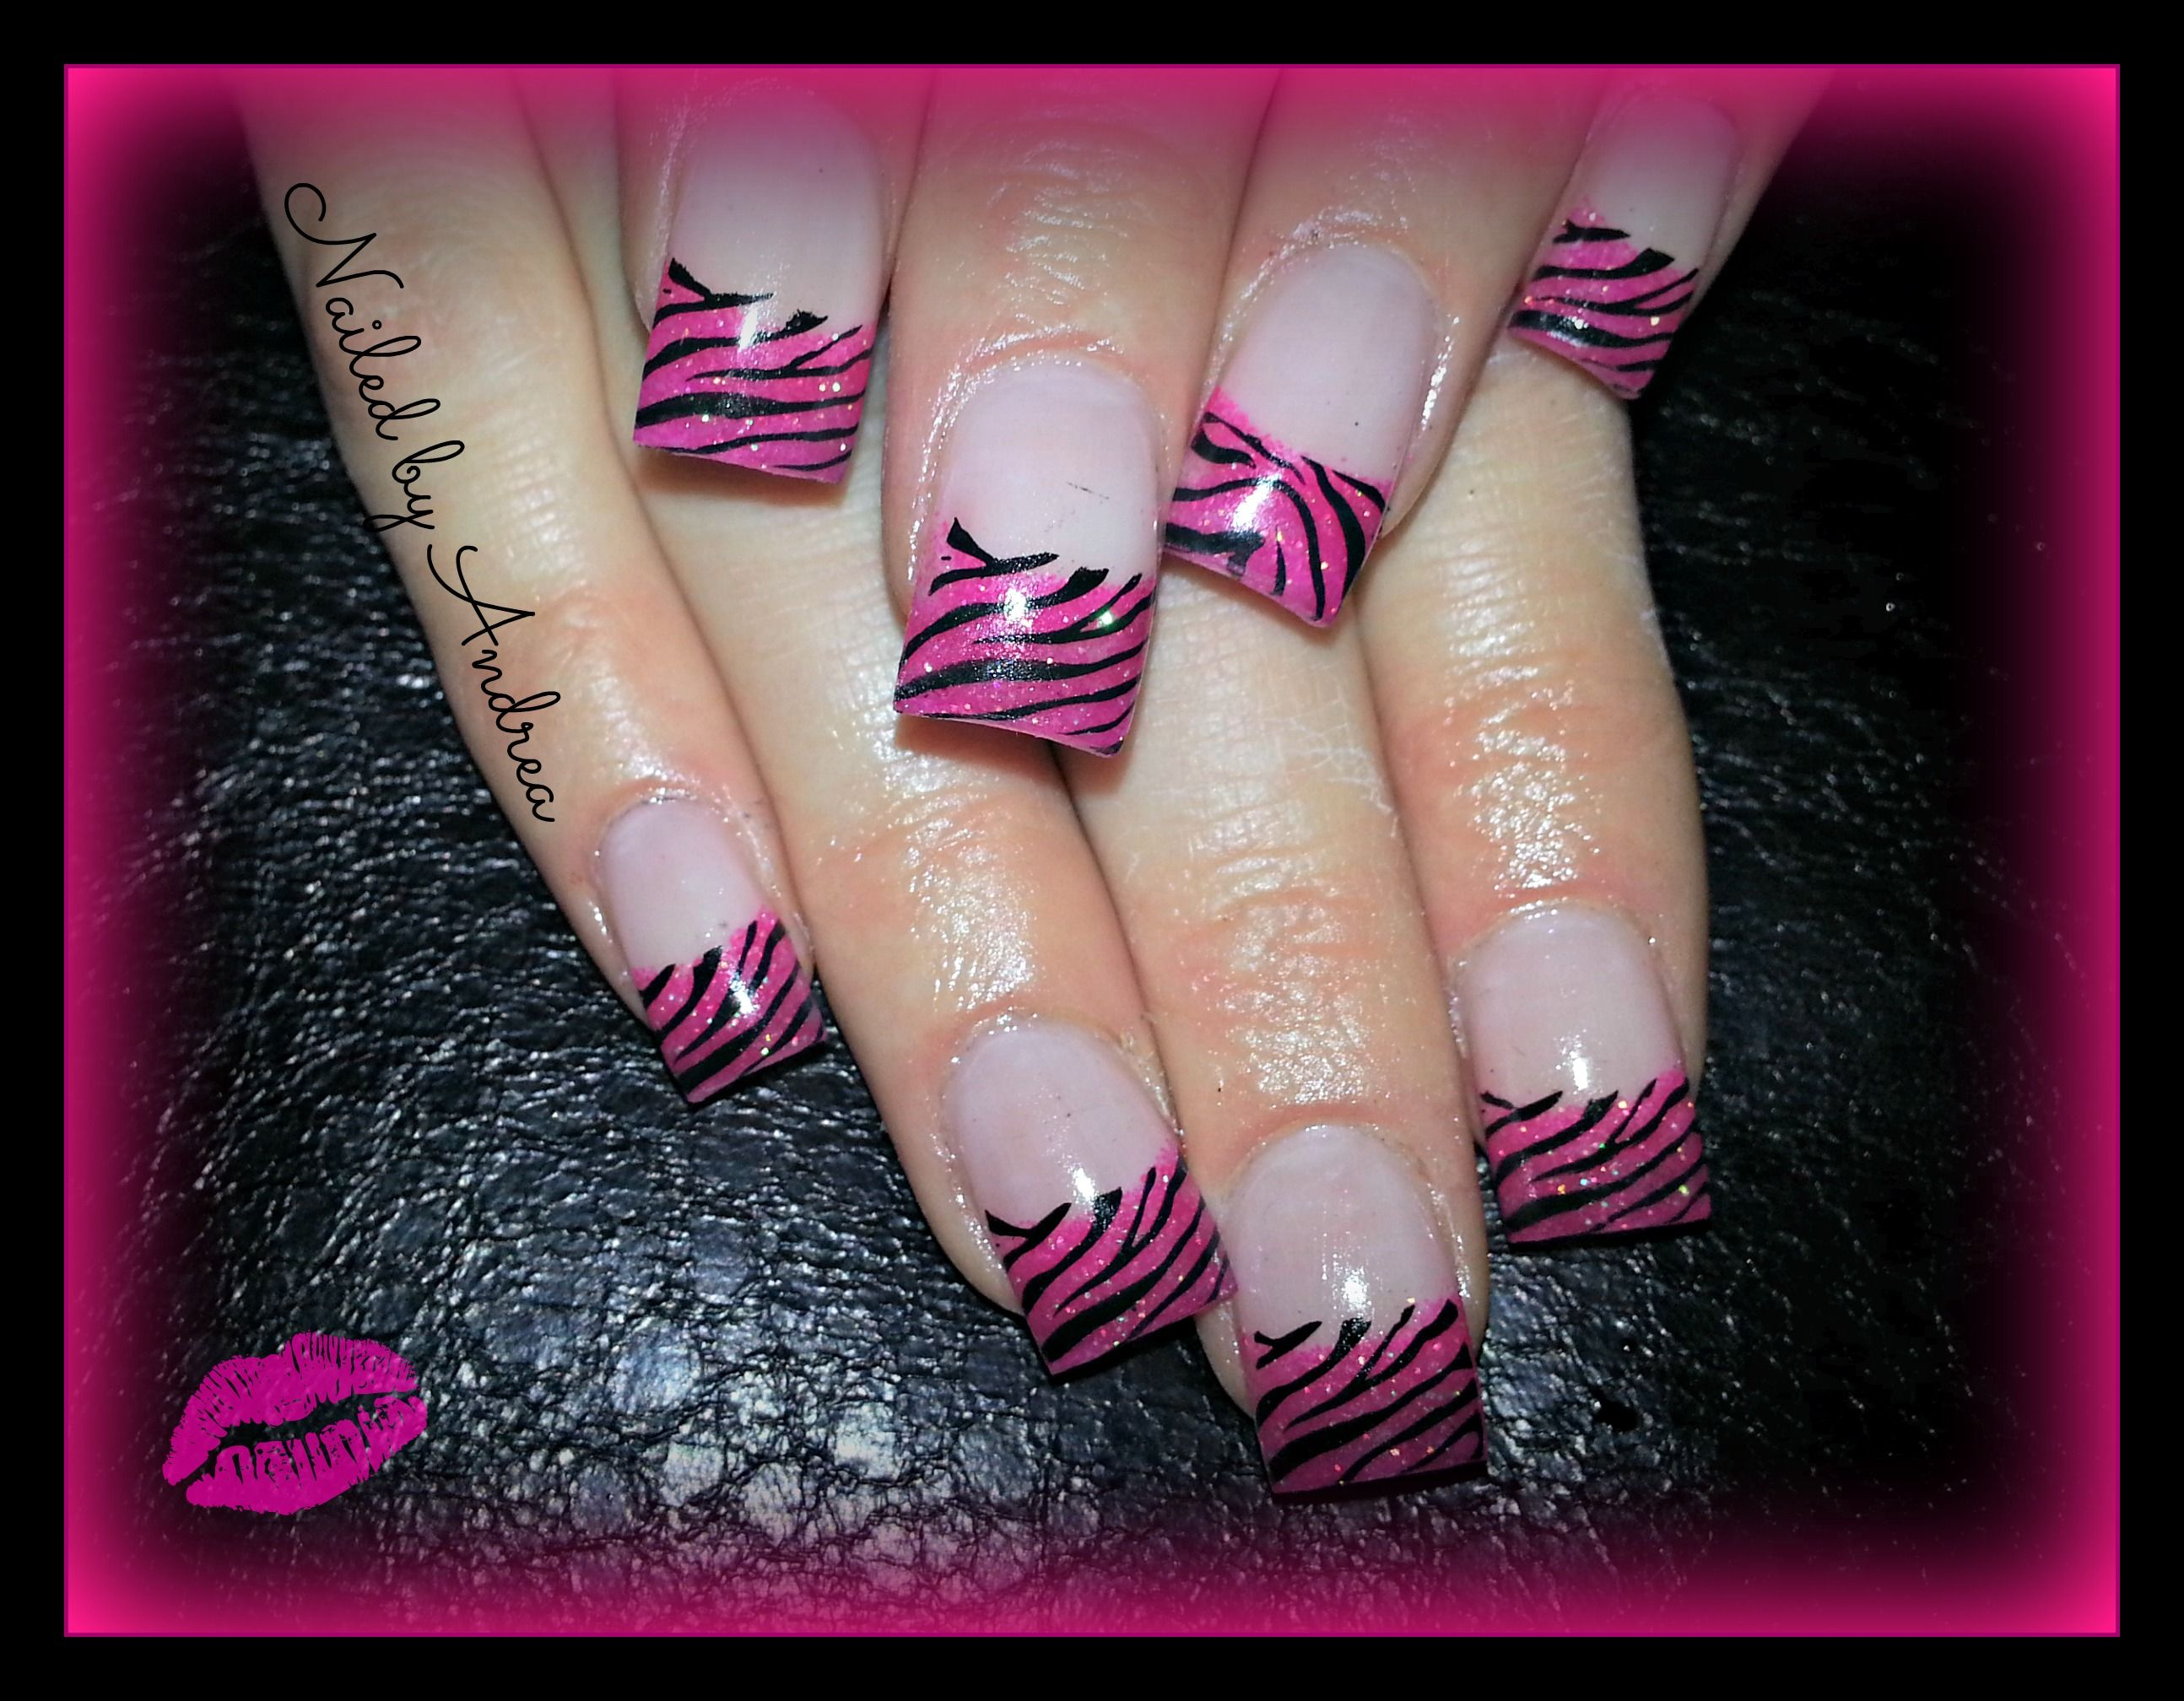 Pink zebra nails nails pinterest - Hot Pink Zebra Gel Nails